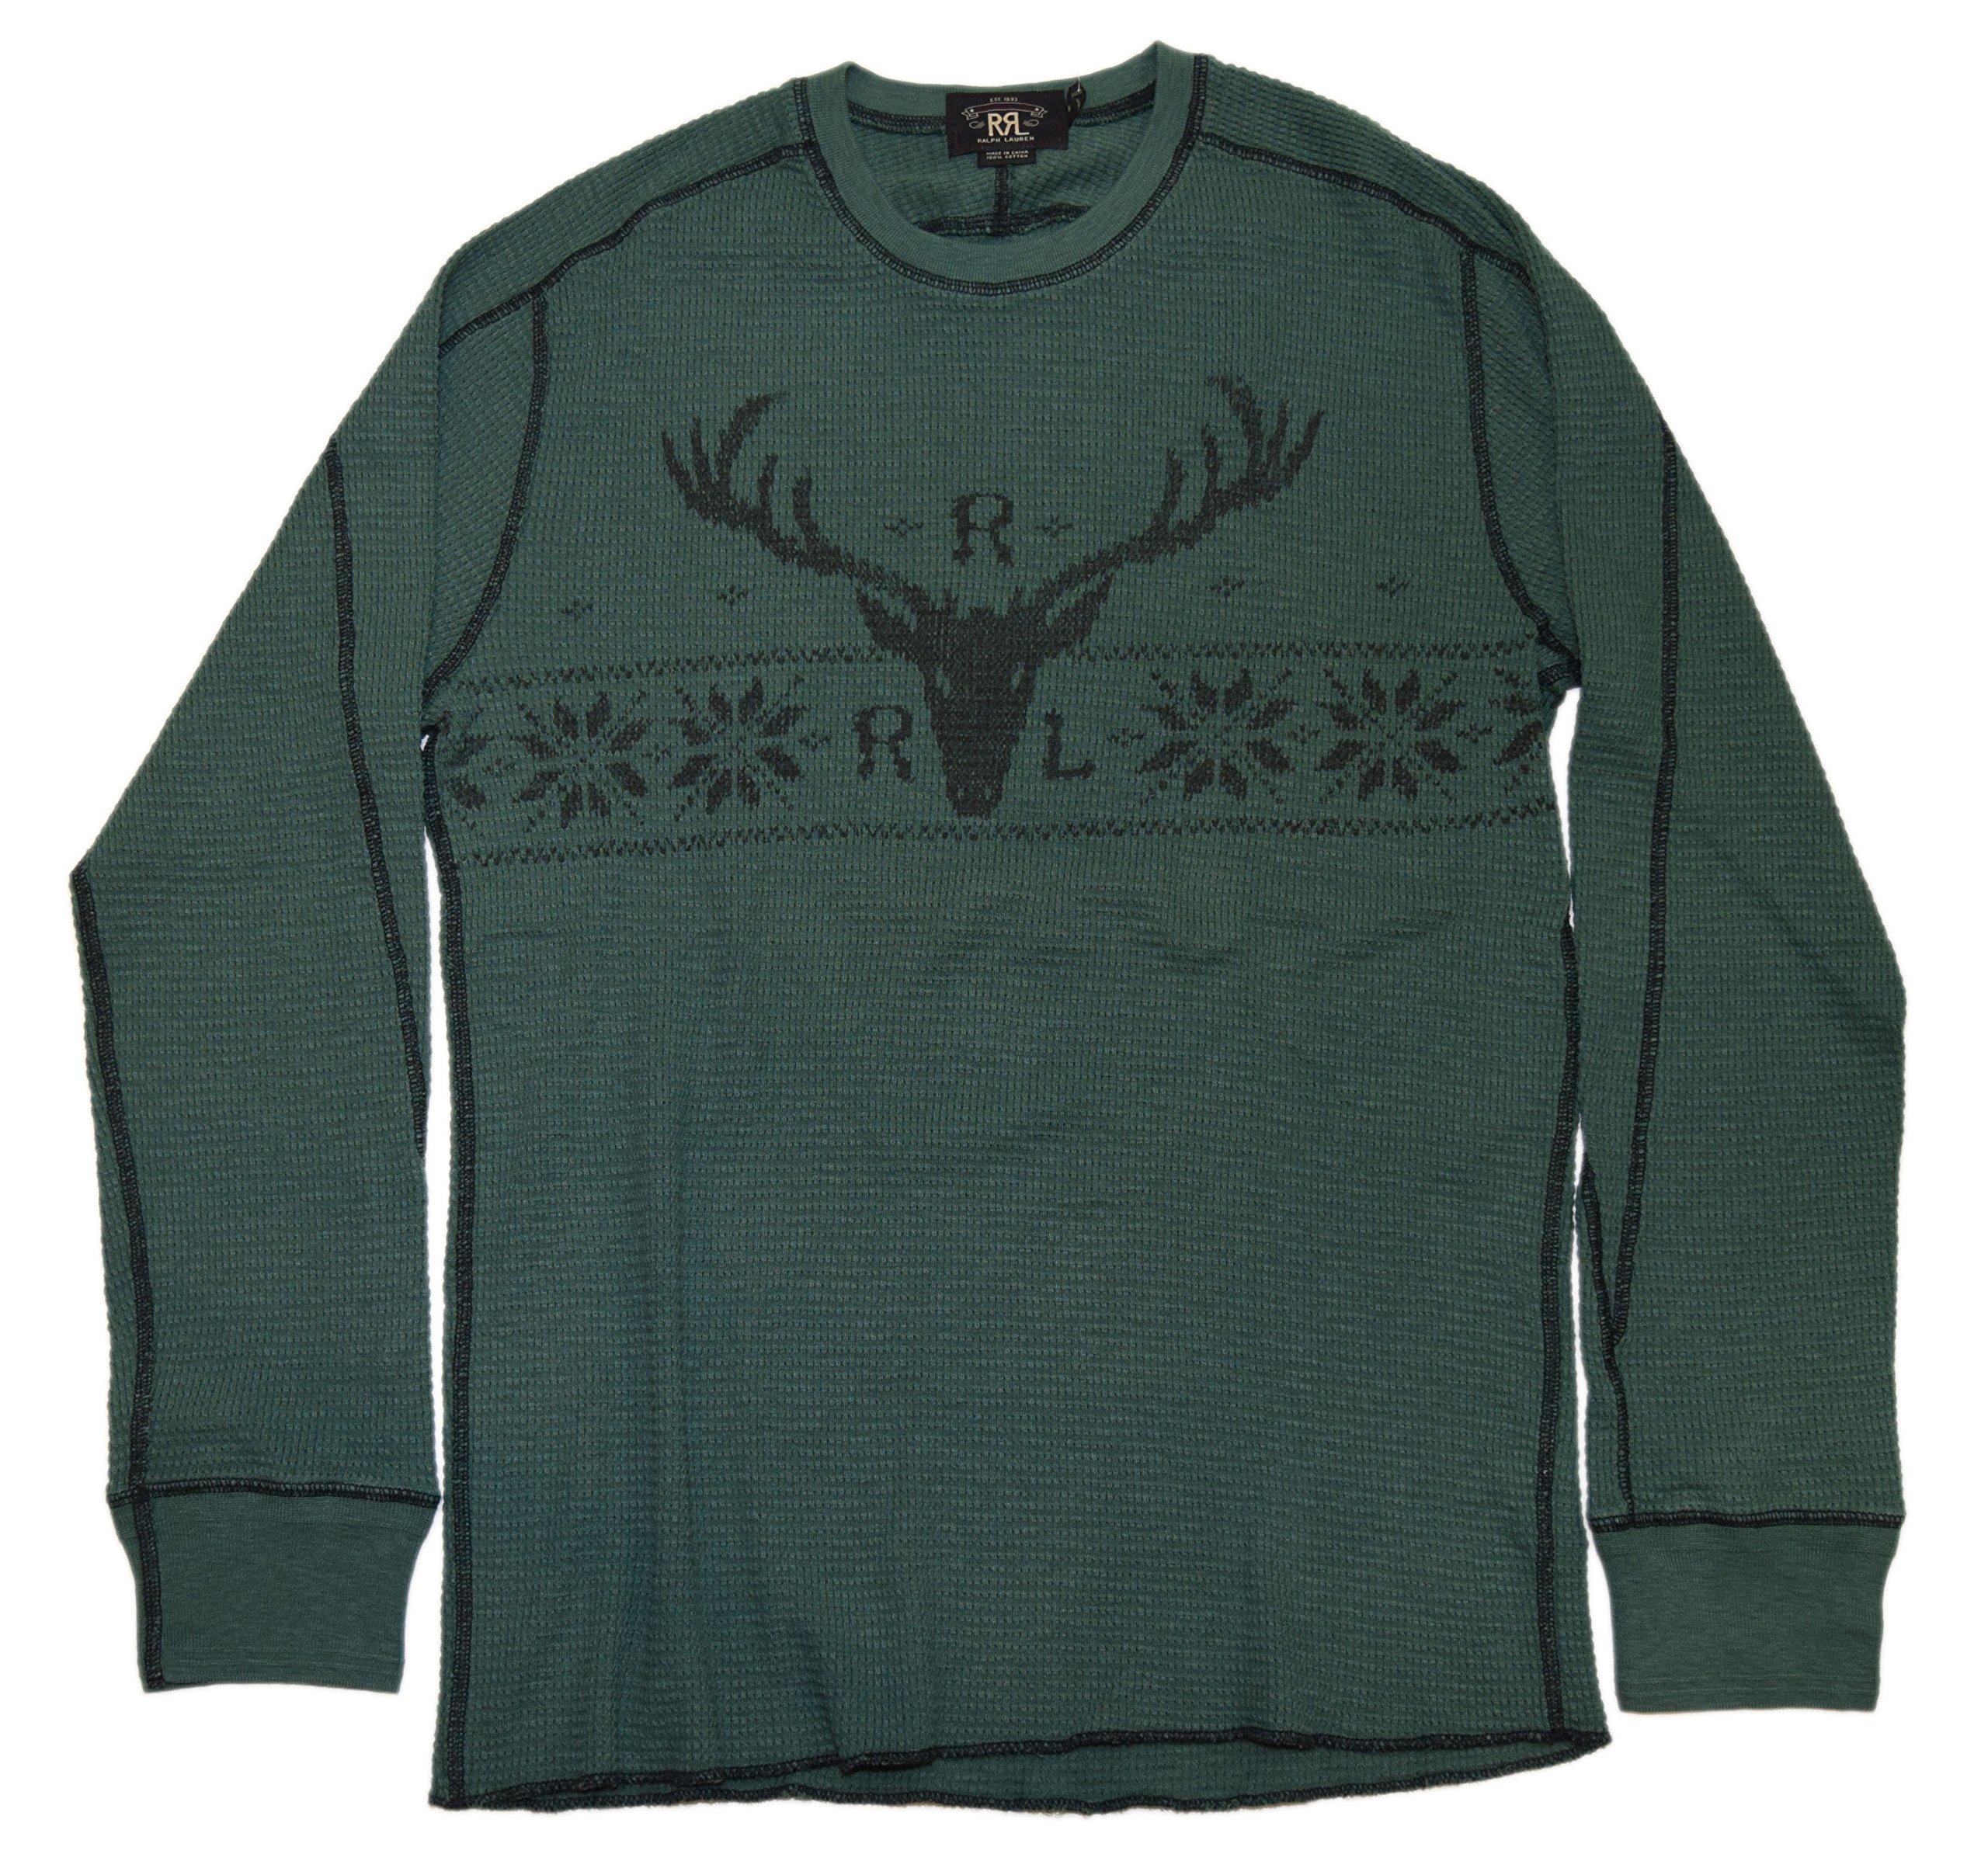 Ralph Lauren Double RL RRL Men Hunting Deer Thermal Sweatshirt Shirt Green Large